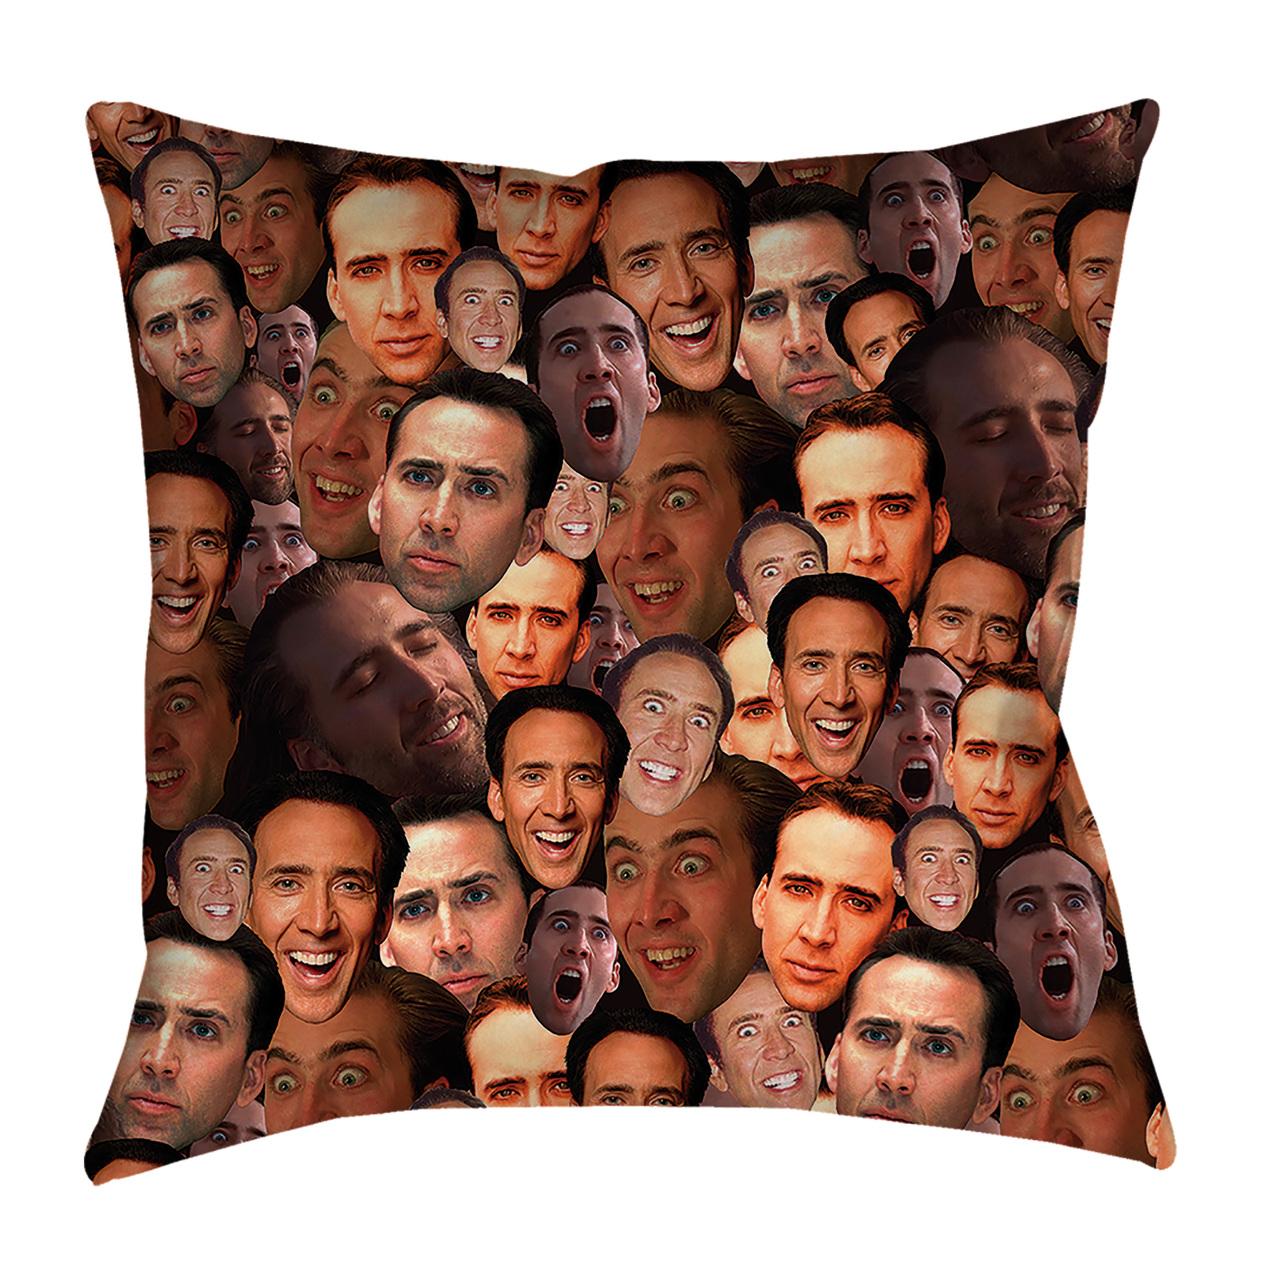 d75e2f294a95ed Nicolas Cage Photo Collage Pillowcase - Subliworks